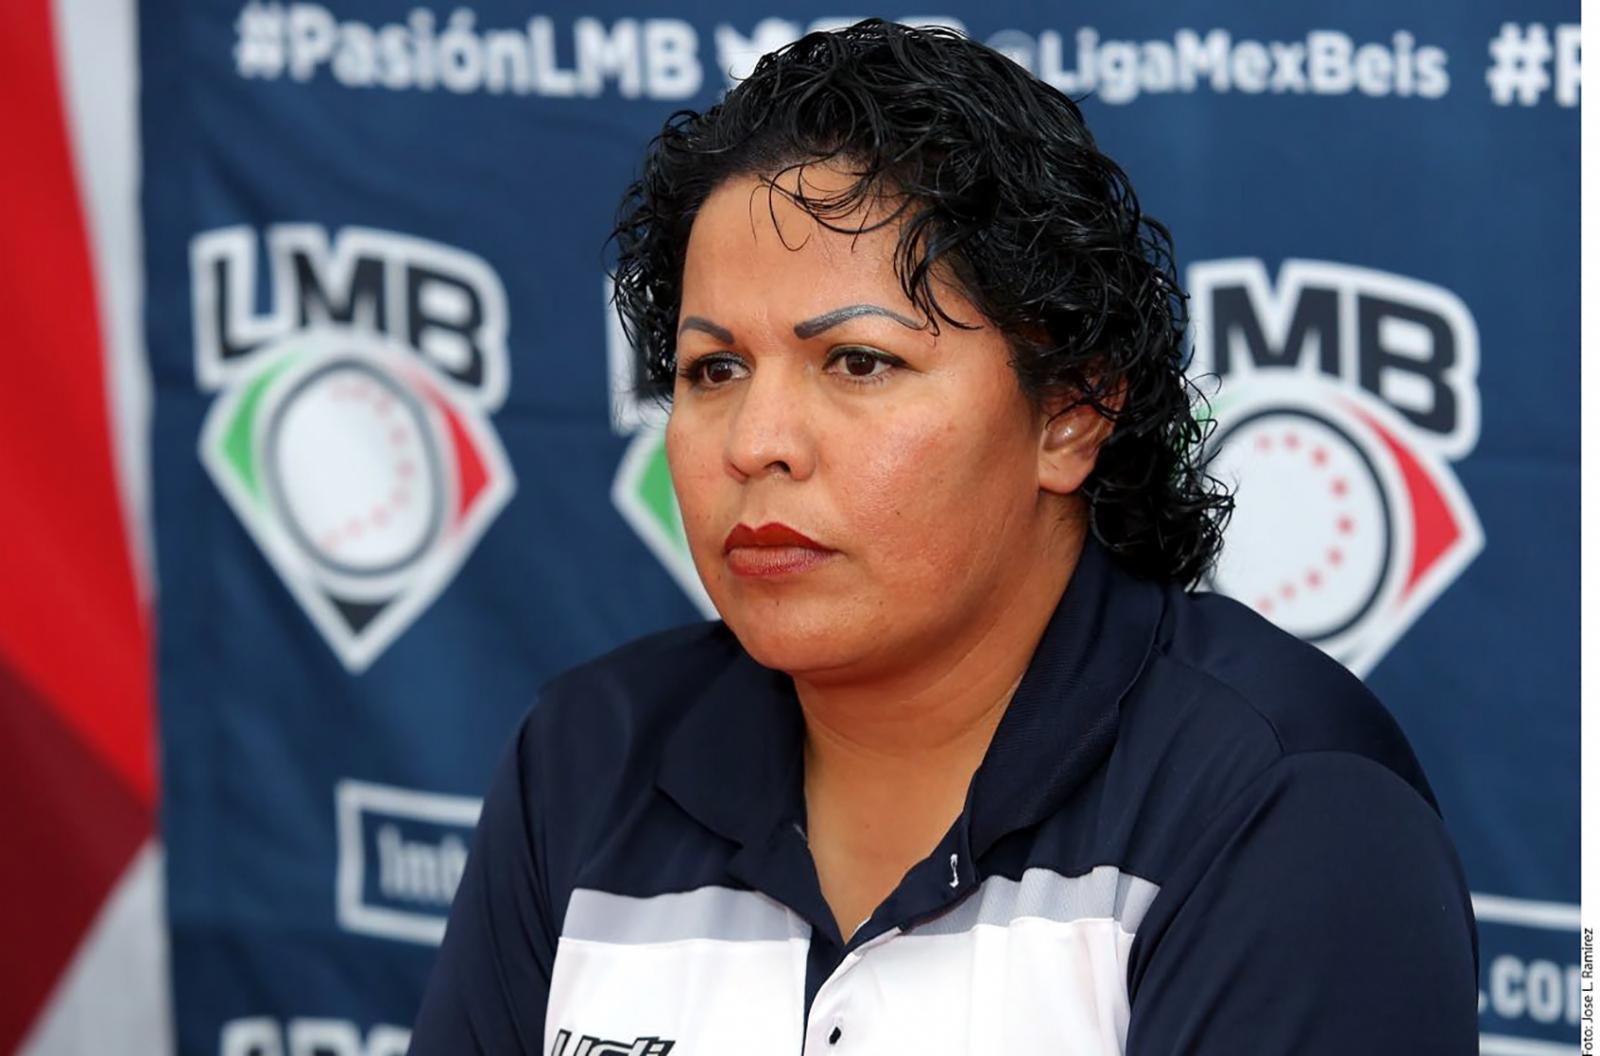 Luz Alicia Gordoa hará historia como umpire en LMB